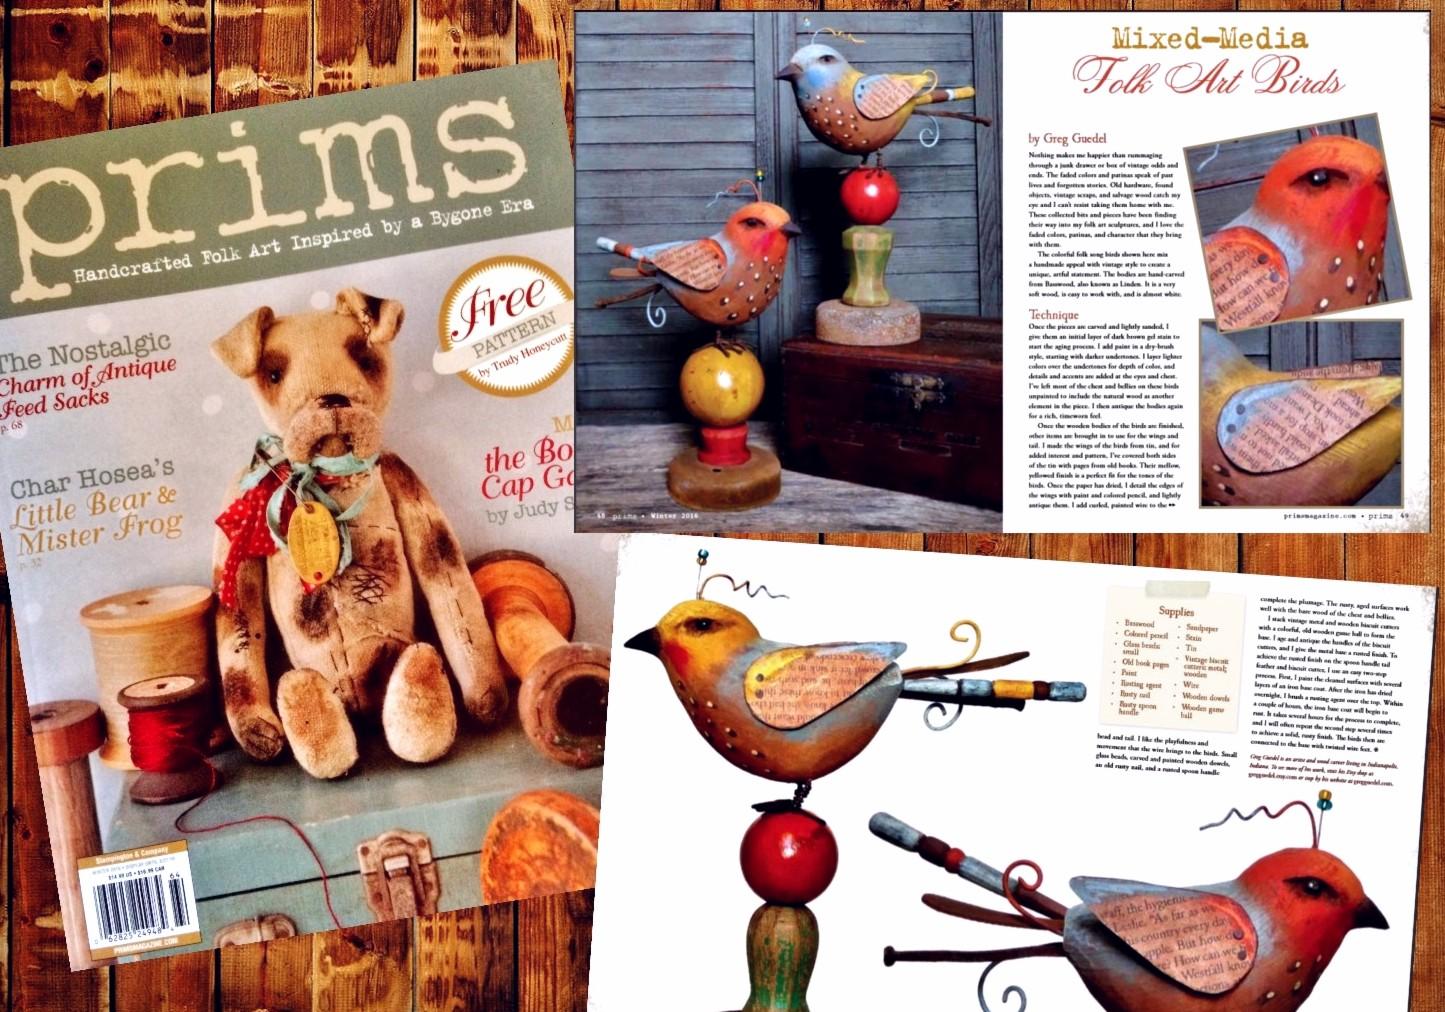 Greg Guedel folk art bird assemblages. Prims magazine winter 2016 issue